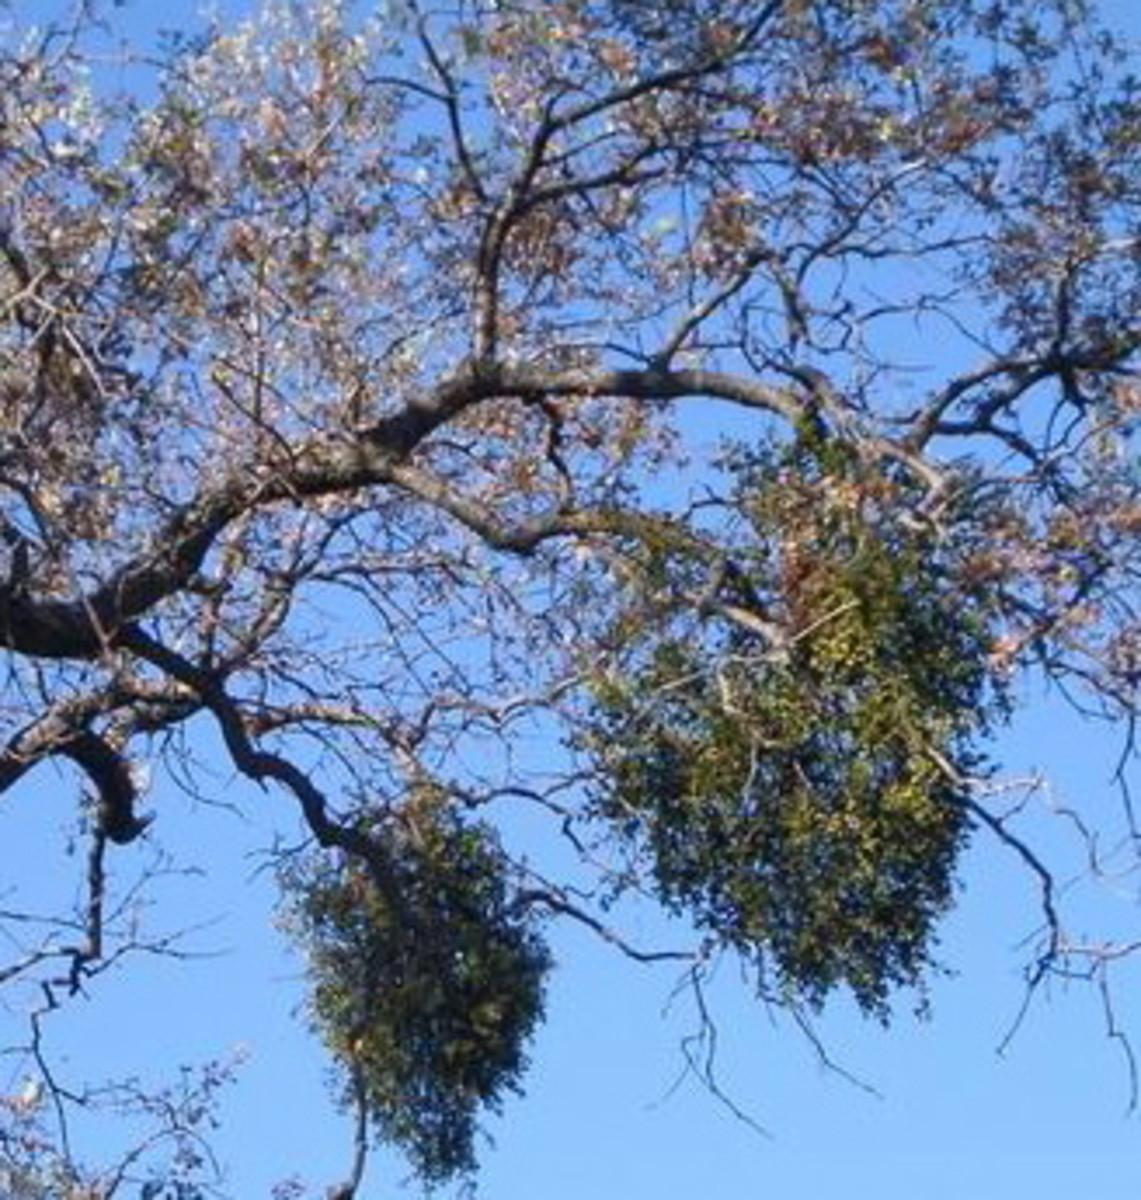 Mistletoe is a parasite